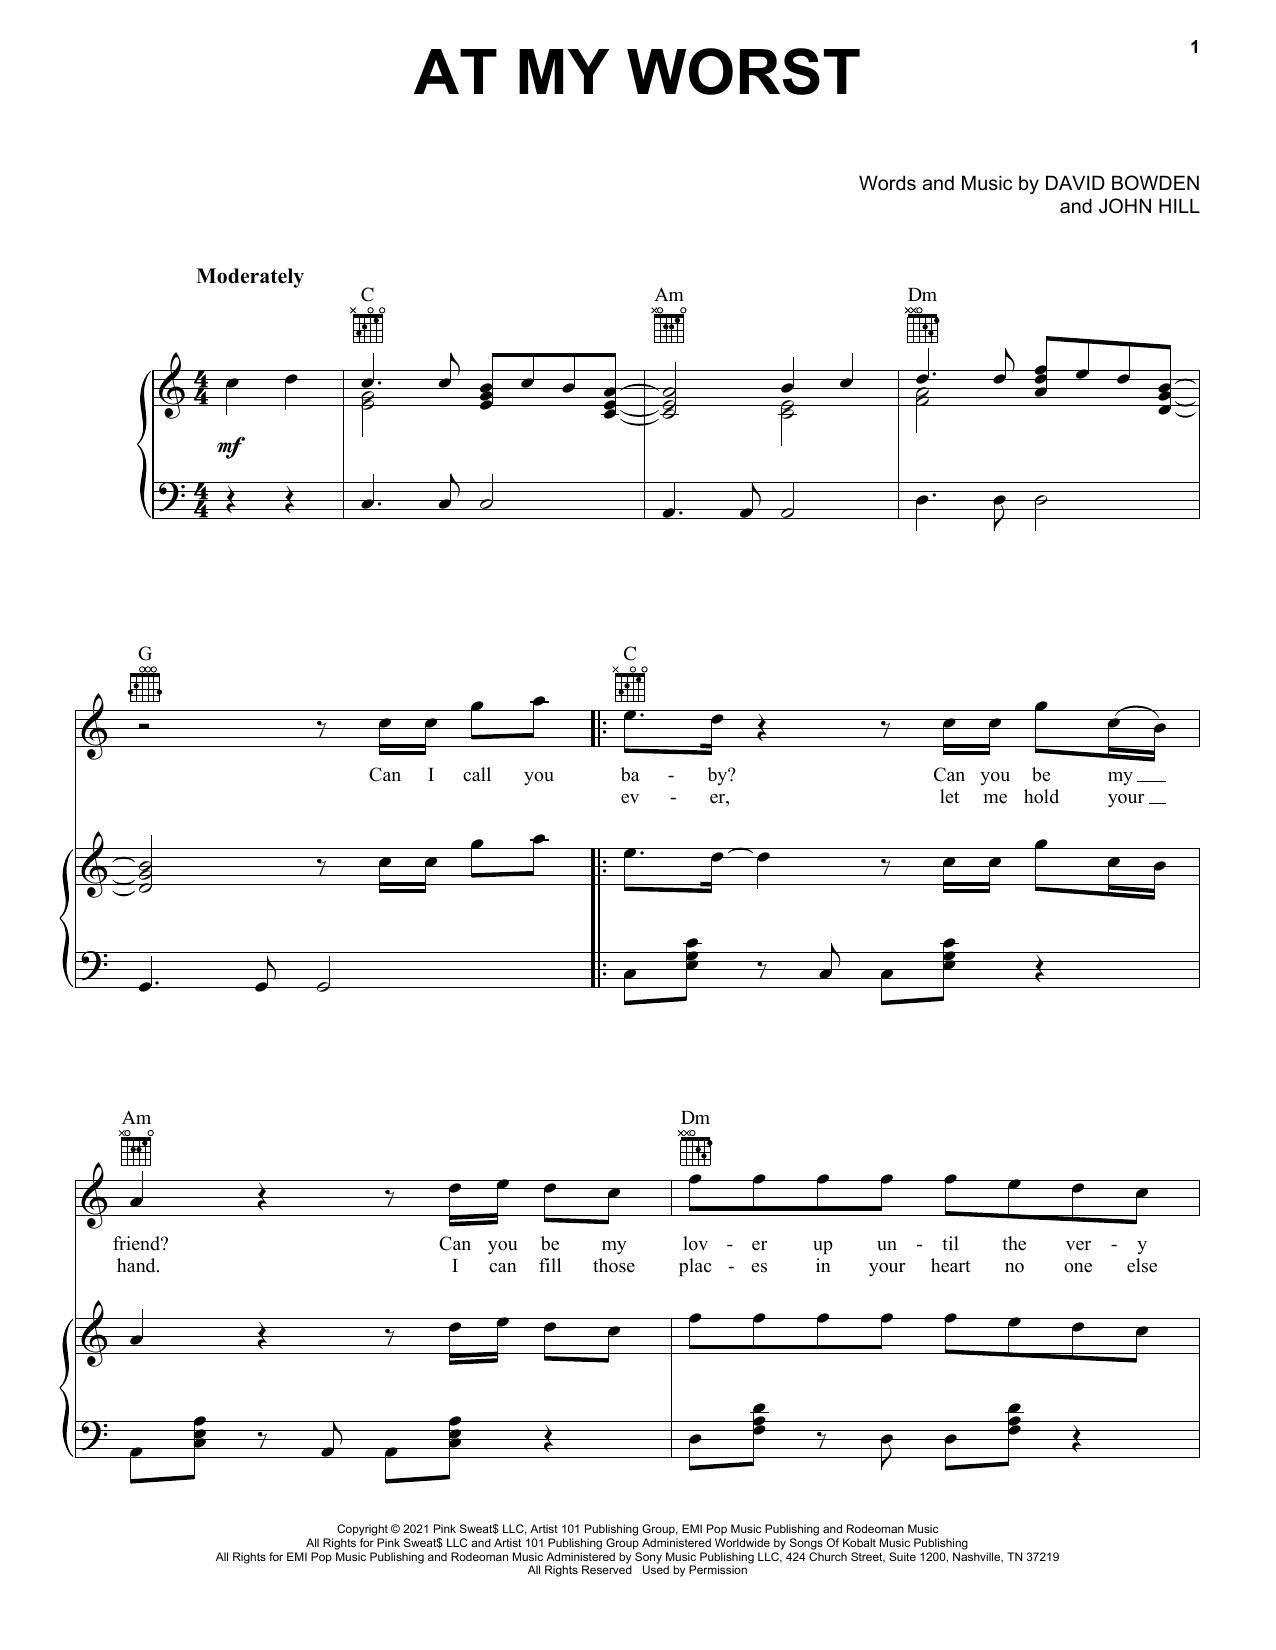 At My Worst sheet music